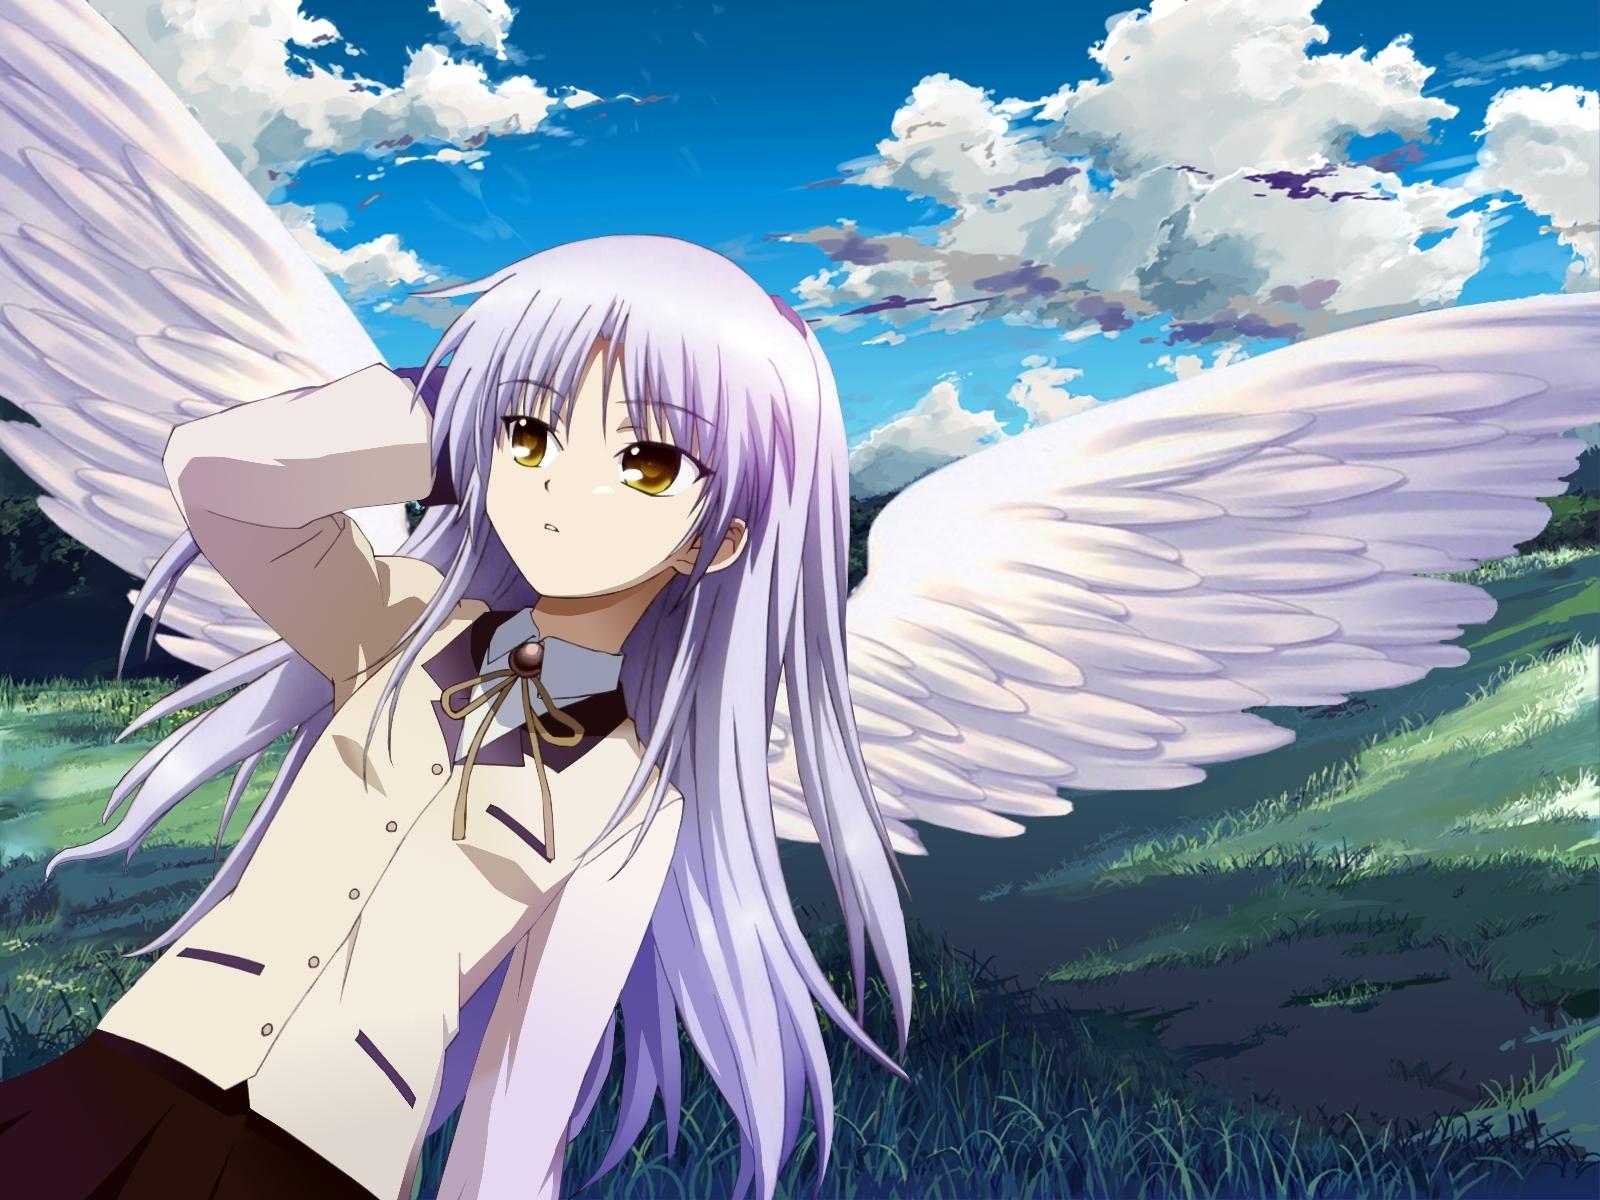 (Cover) Angel Beats! Wings-of-tenshi-angel-beats-kanade